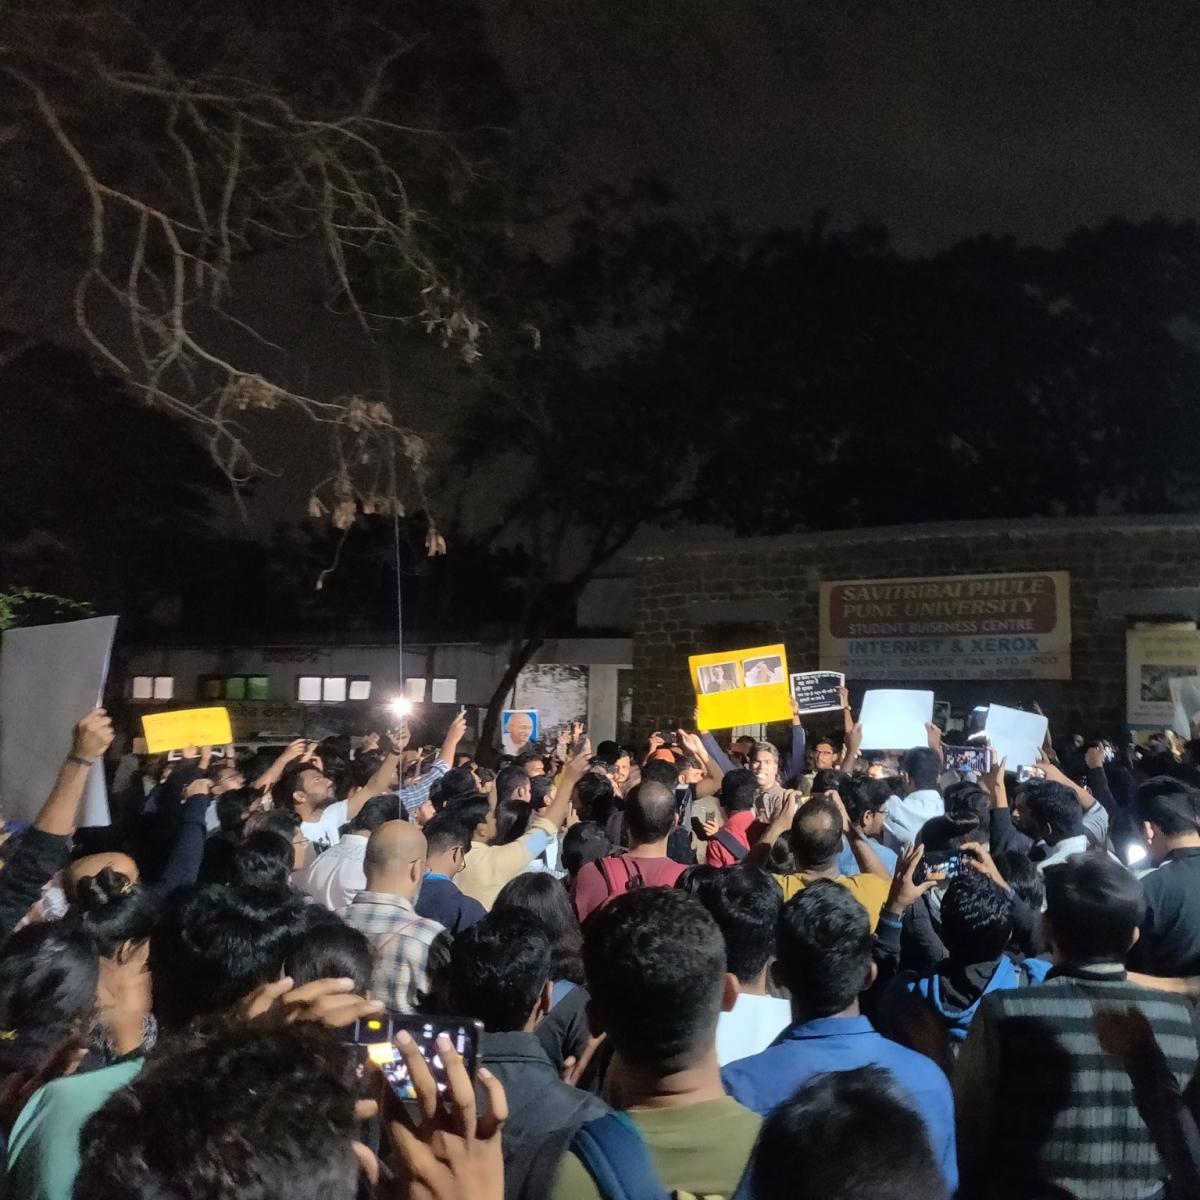 Torch procession at Pune varsity against Citizenship Amendment Act